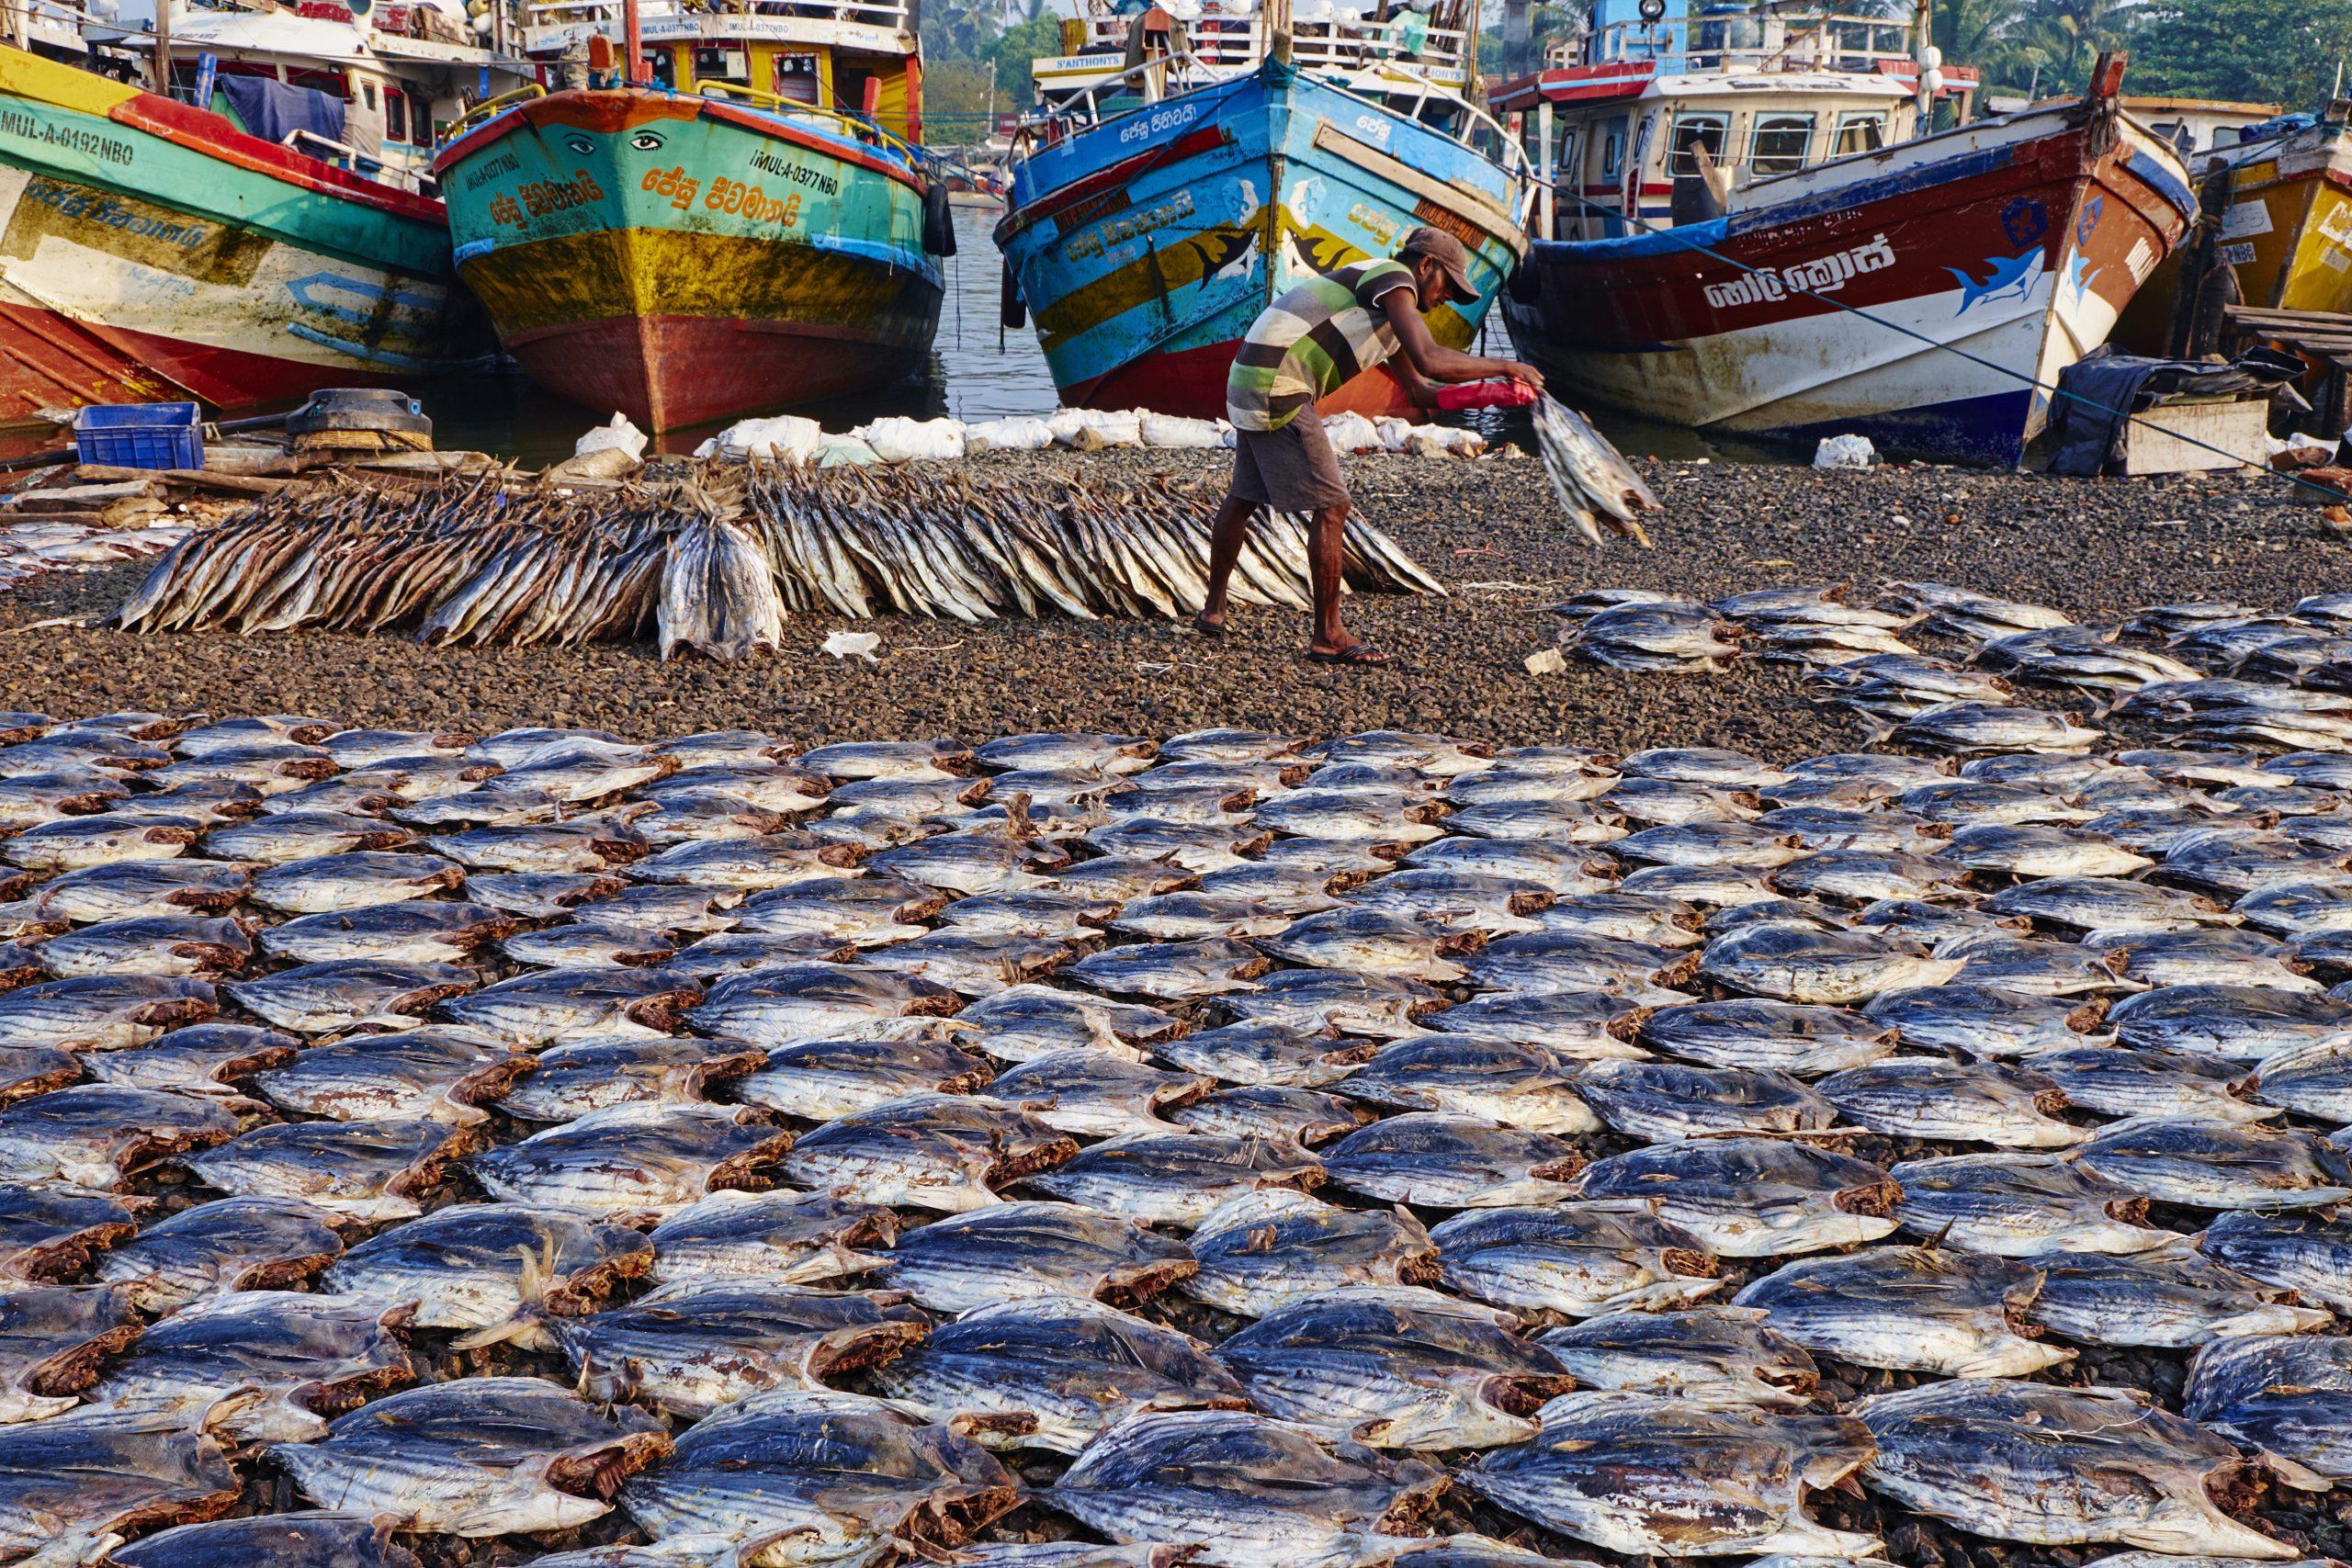 Sri Lanka, Negombo, fishermen's village